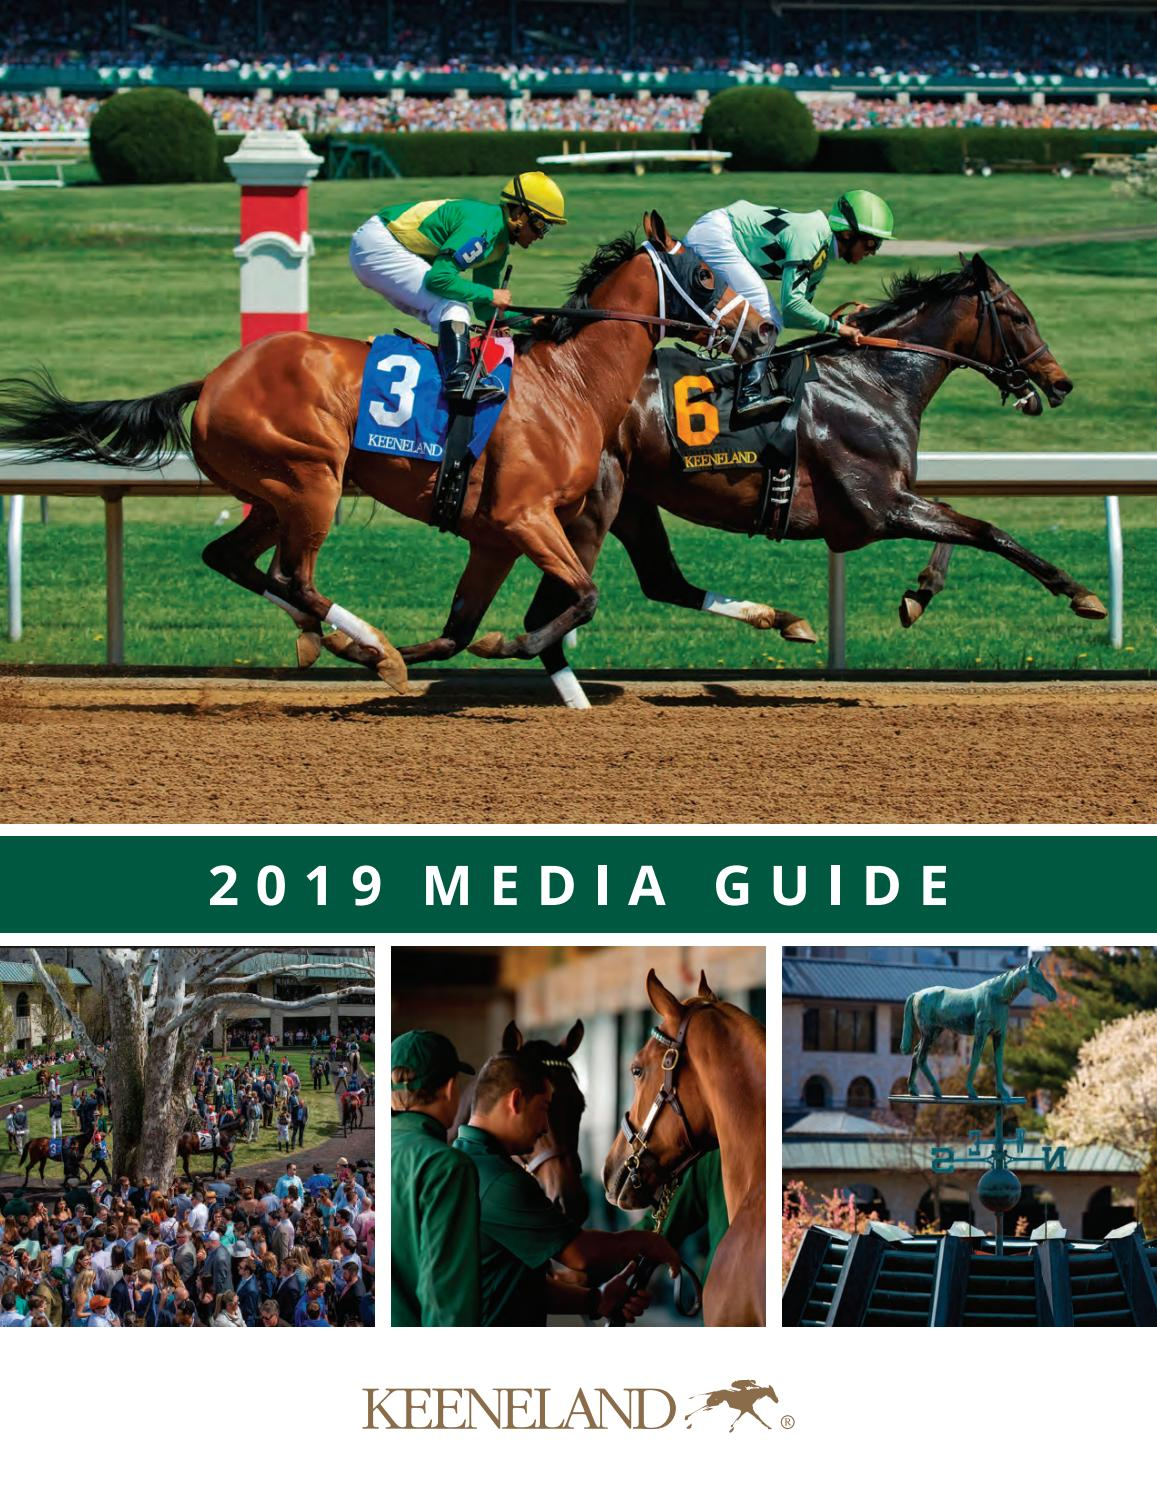 8b718e4a61ad0 2019 Keeneland Media Guide by Keeneland - issuu